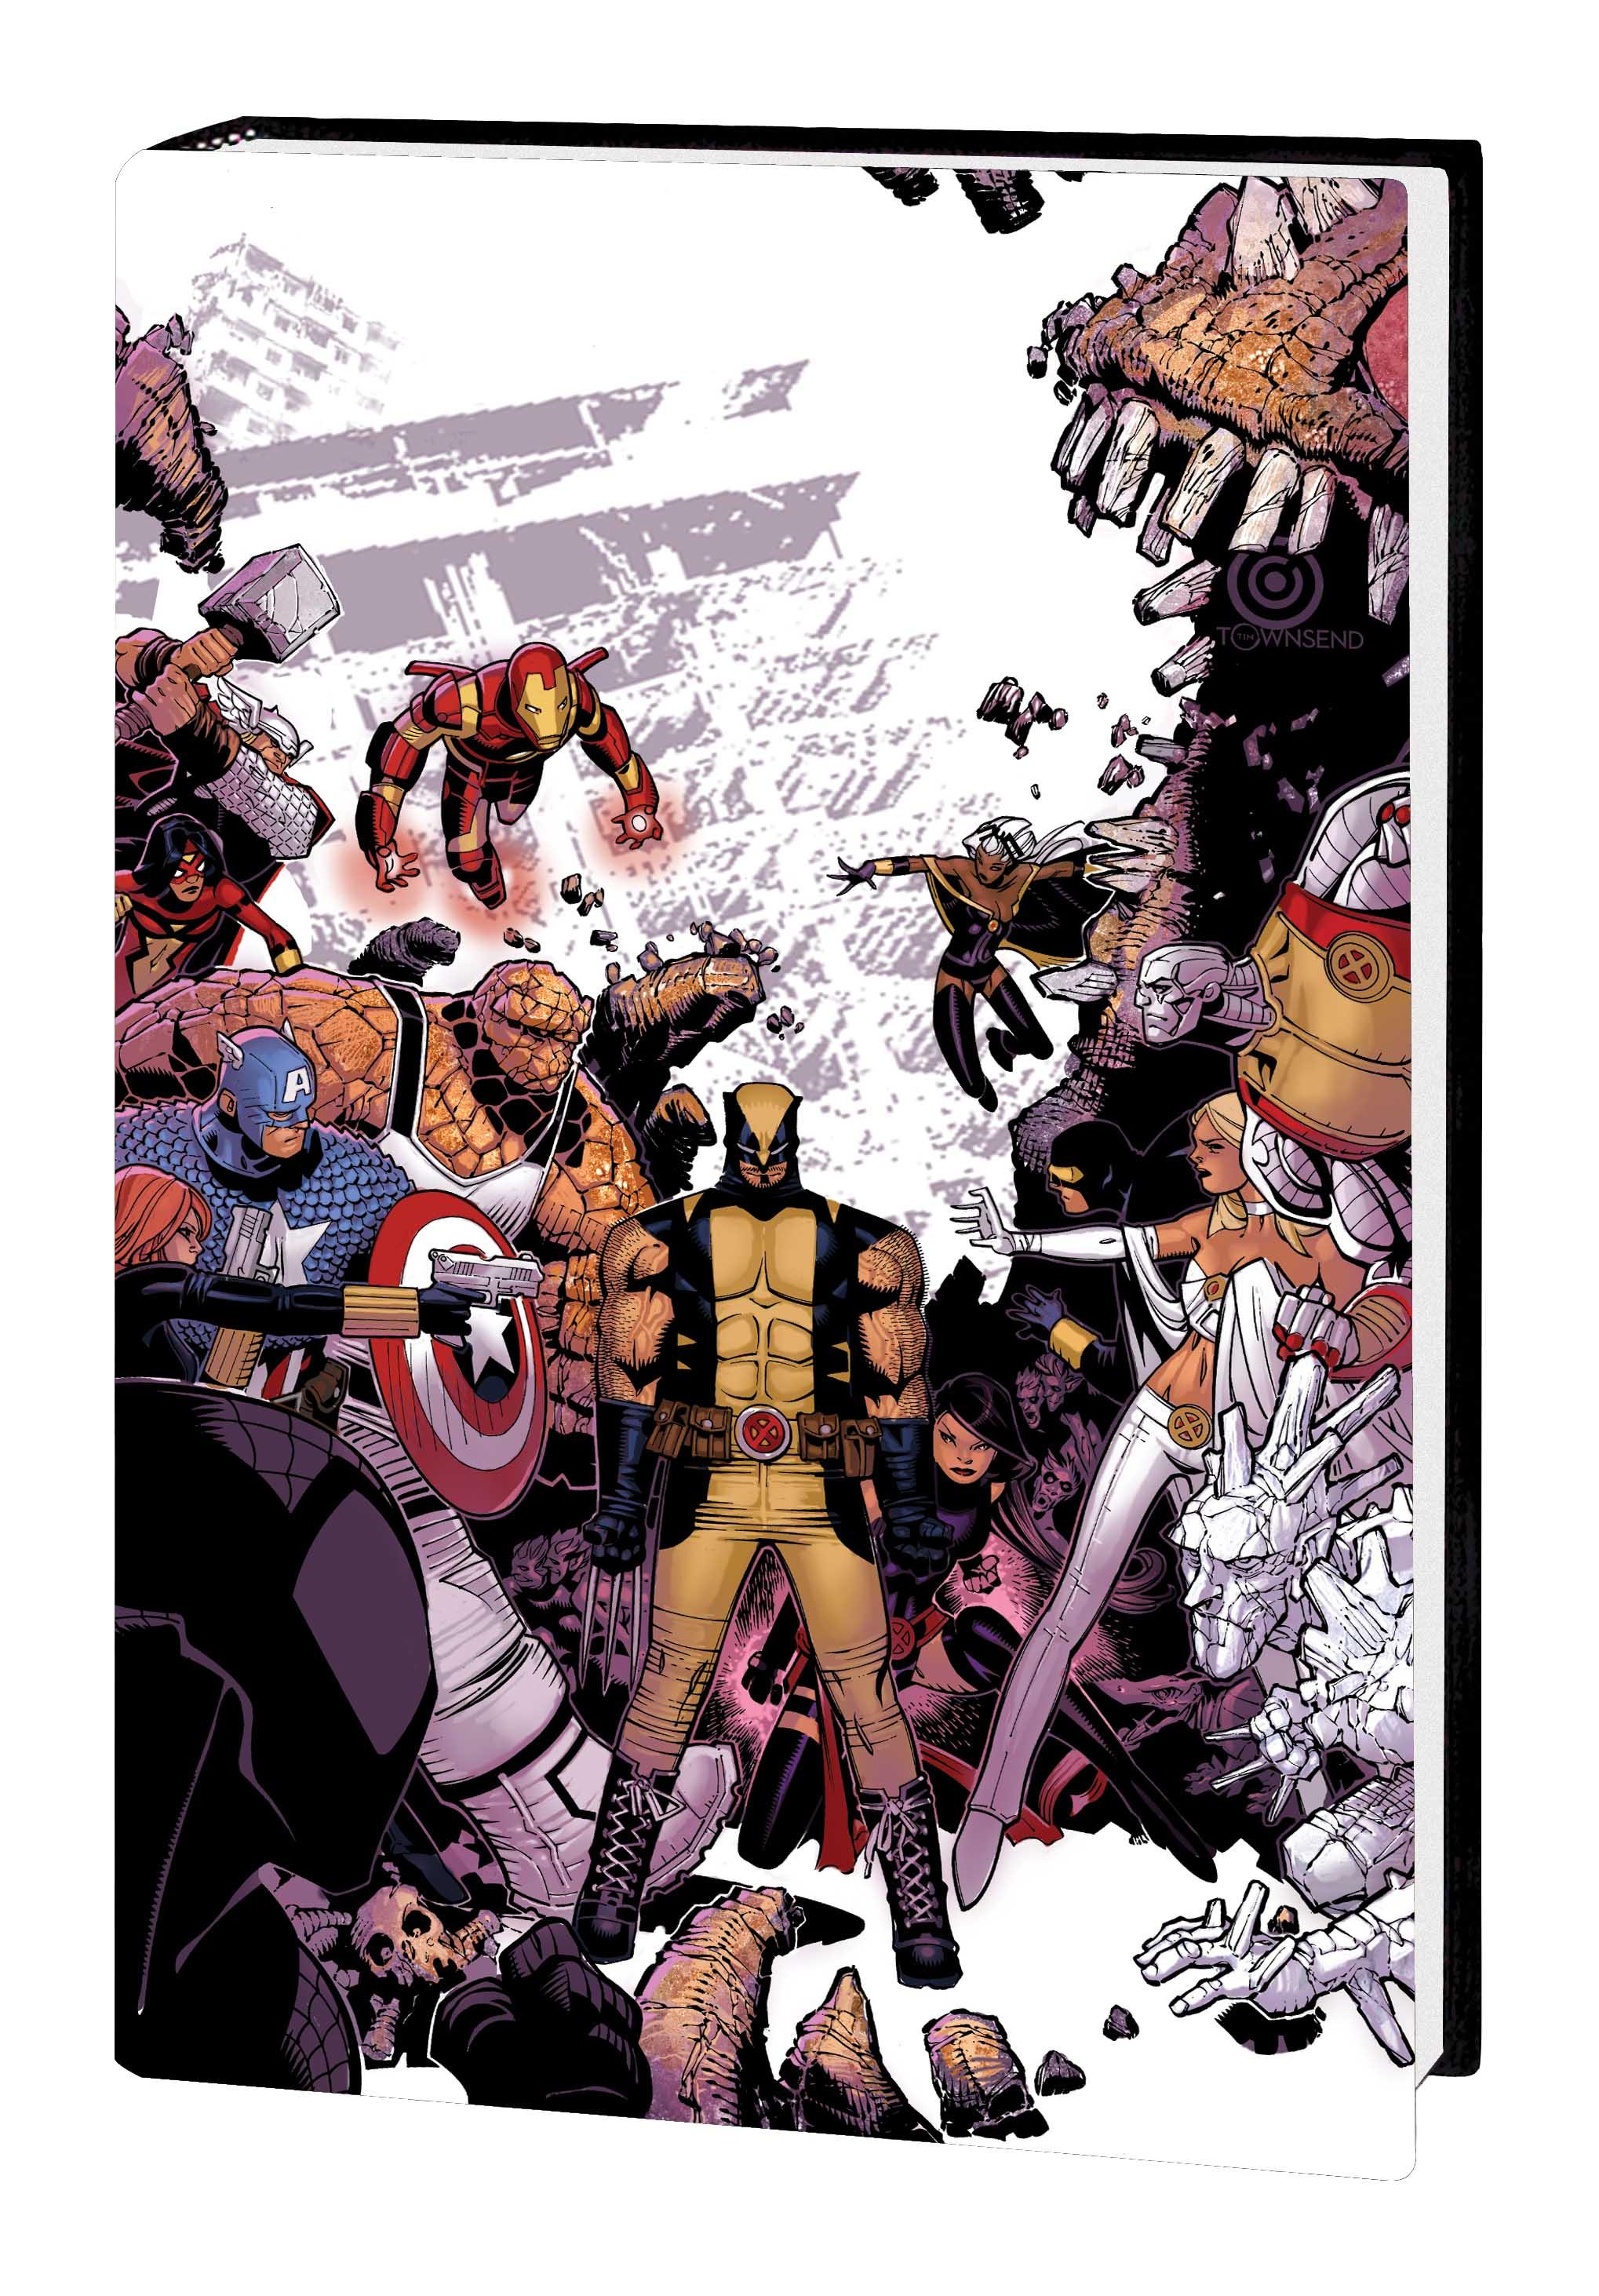 WOLVERINE & THE X-MEN BY JASON AARON VOL. 3 PREMIERE HC (AVX, COMBO) (Hardcover)